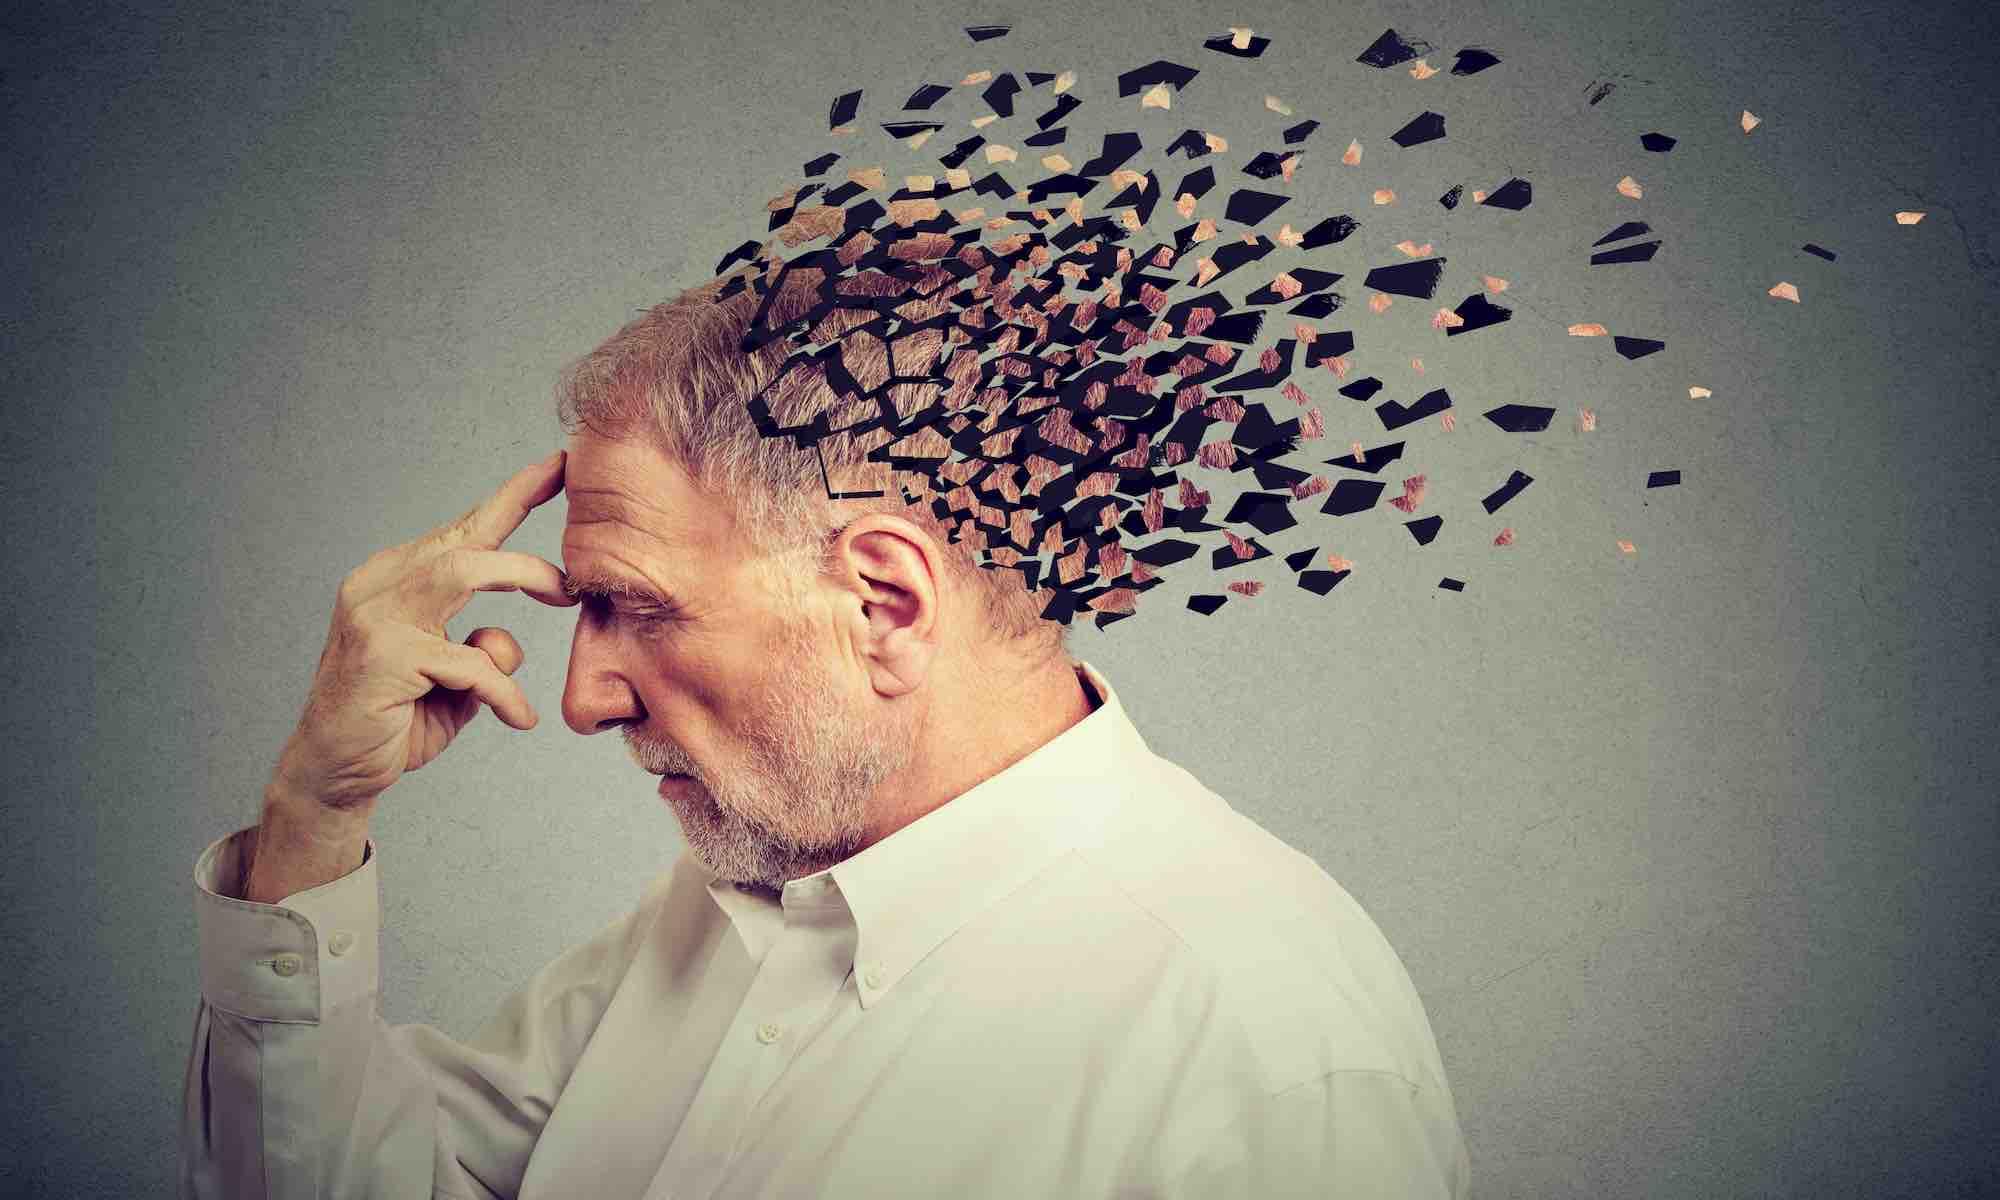 Влияние алкоголя на развитие деменции